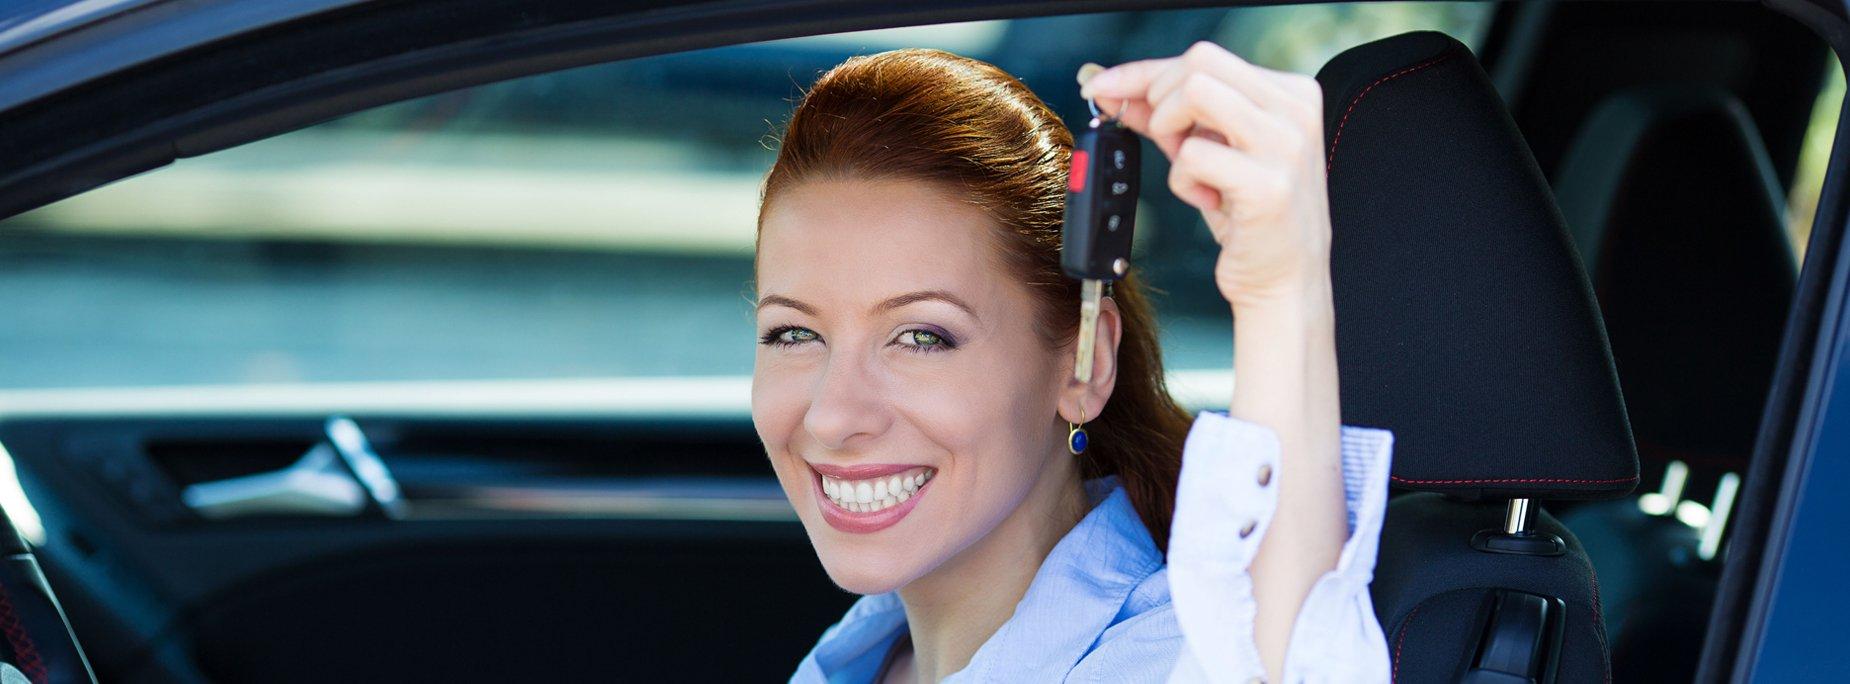 Car Loan with happy customer